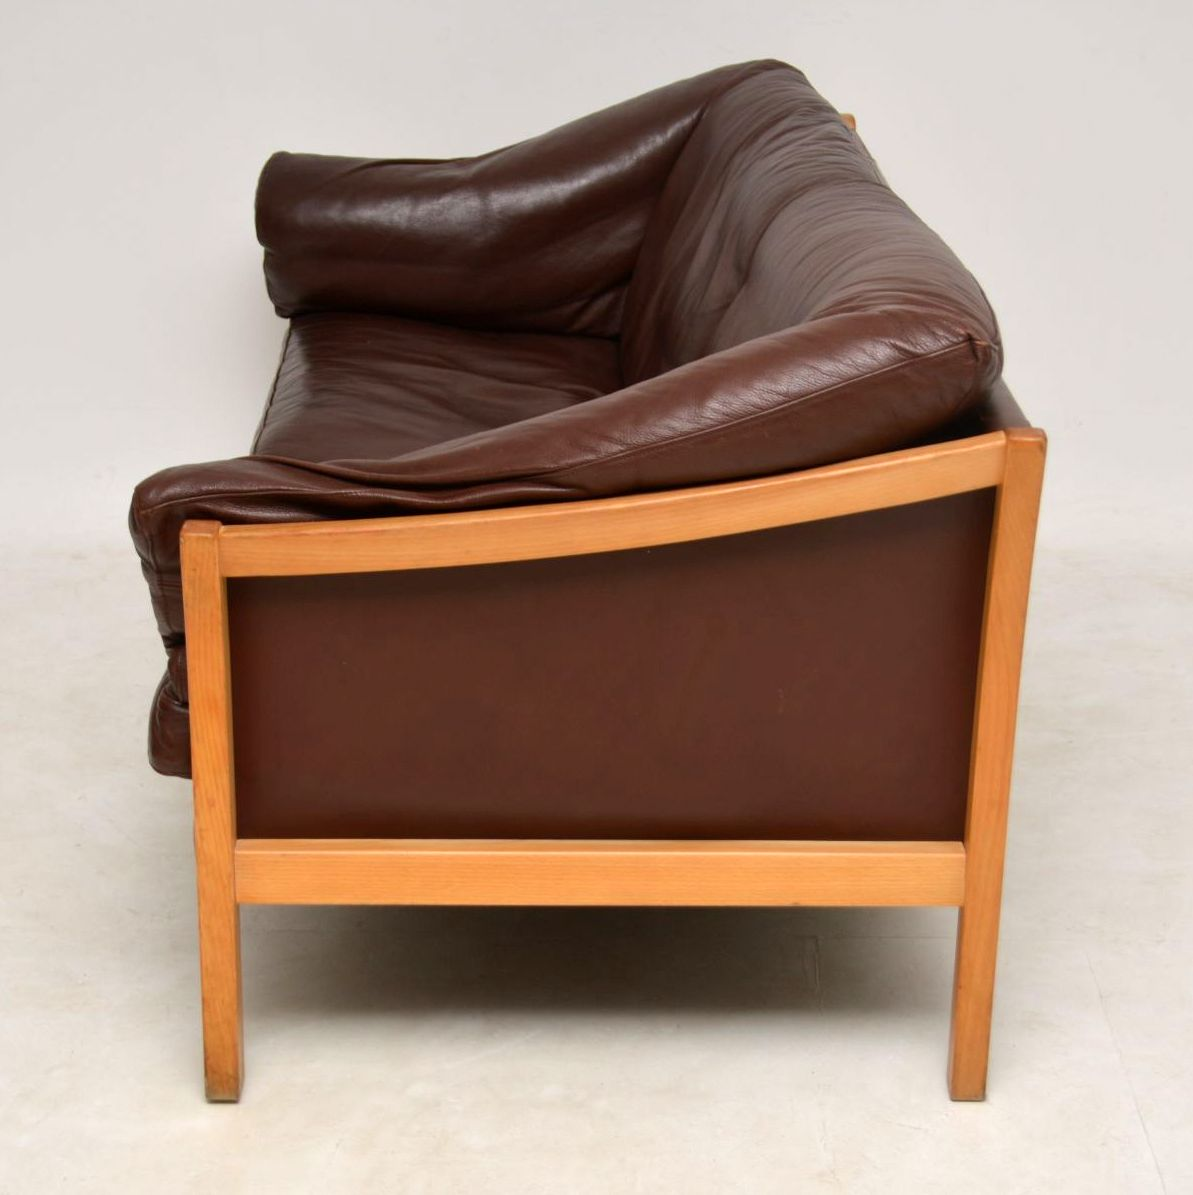 1960 S Danish Vintage Leather Sofa Retrospective Interiors Vintage